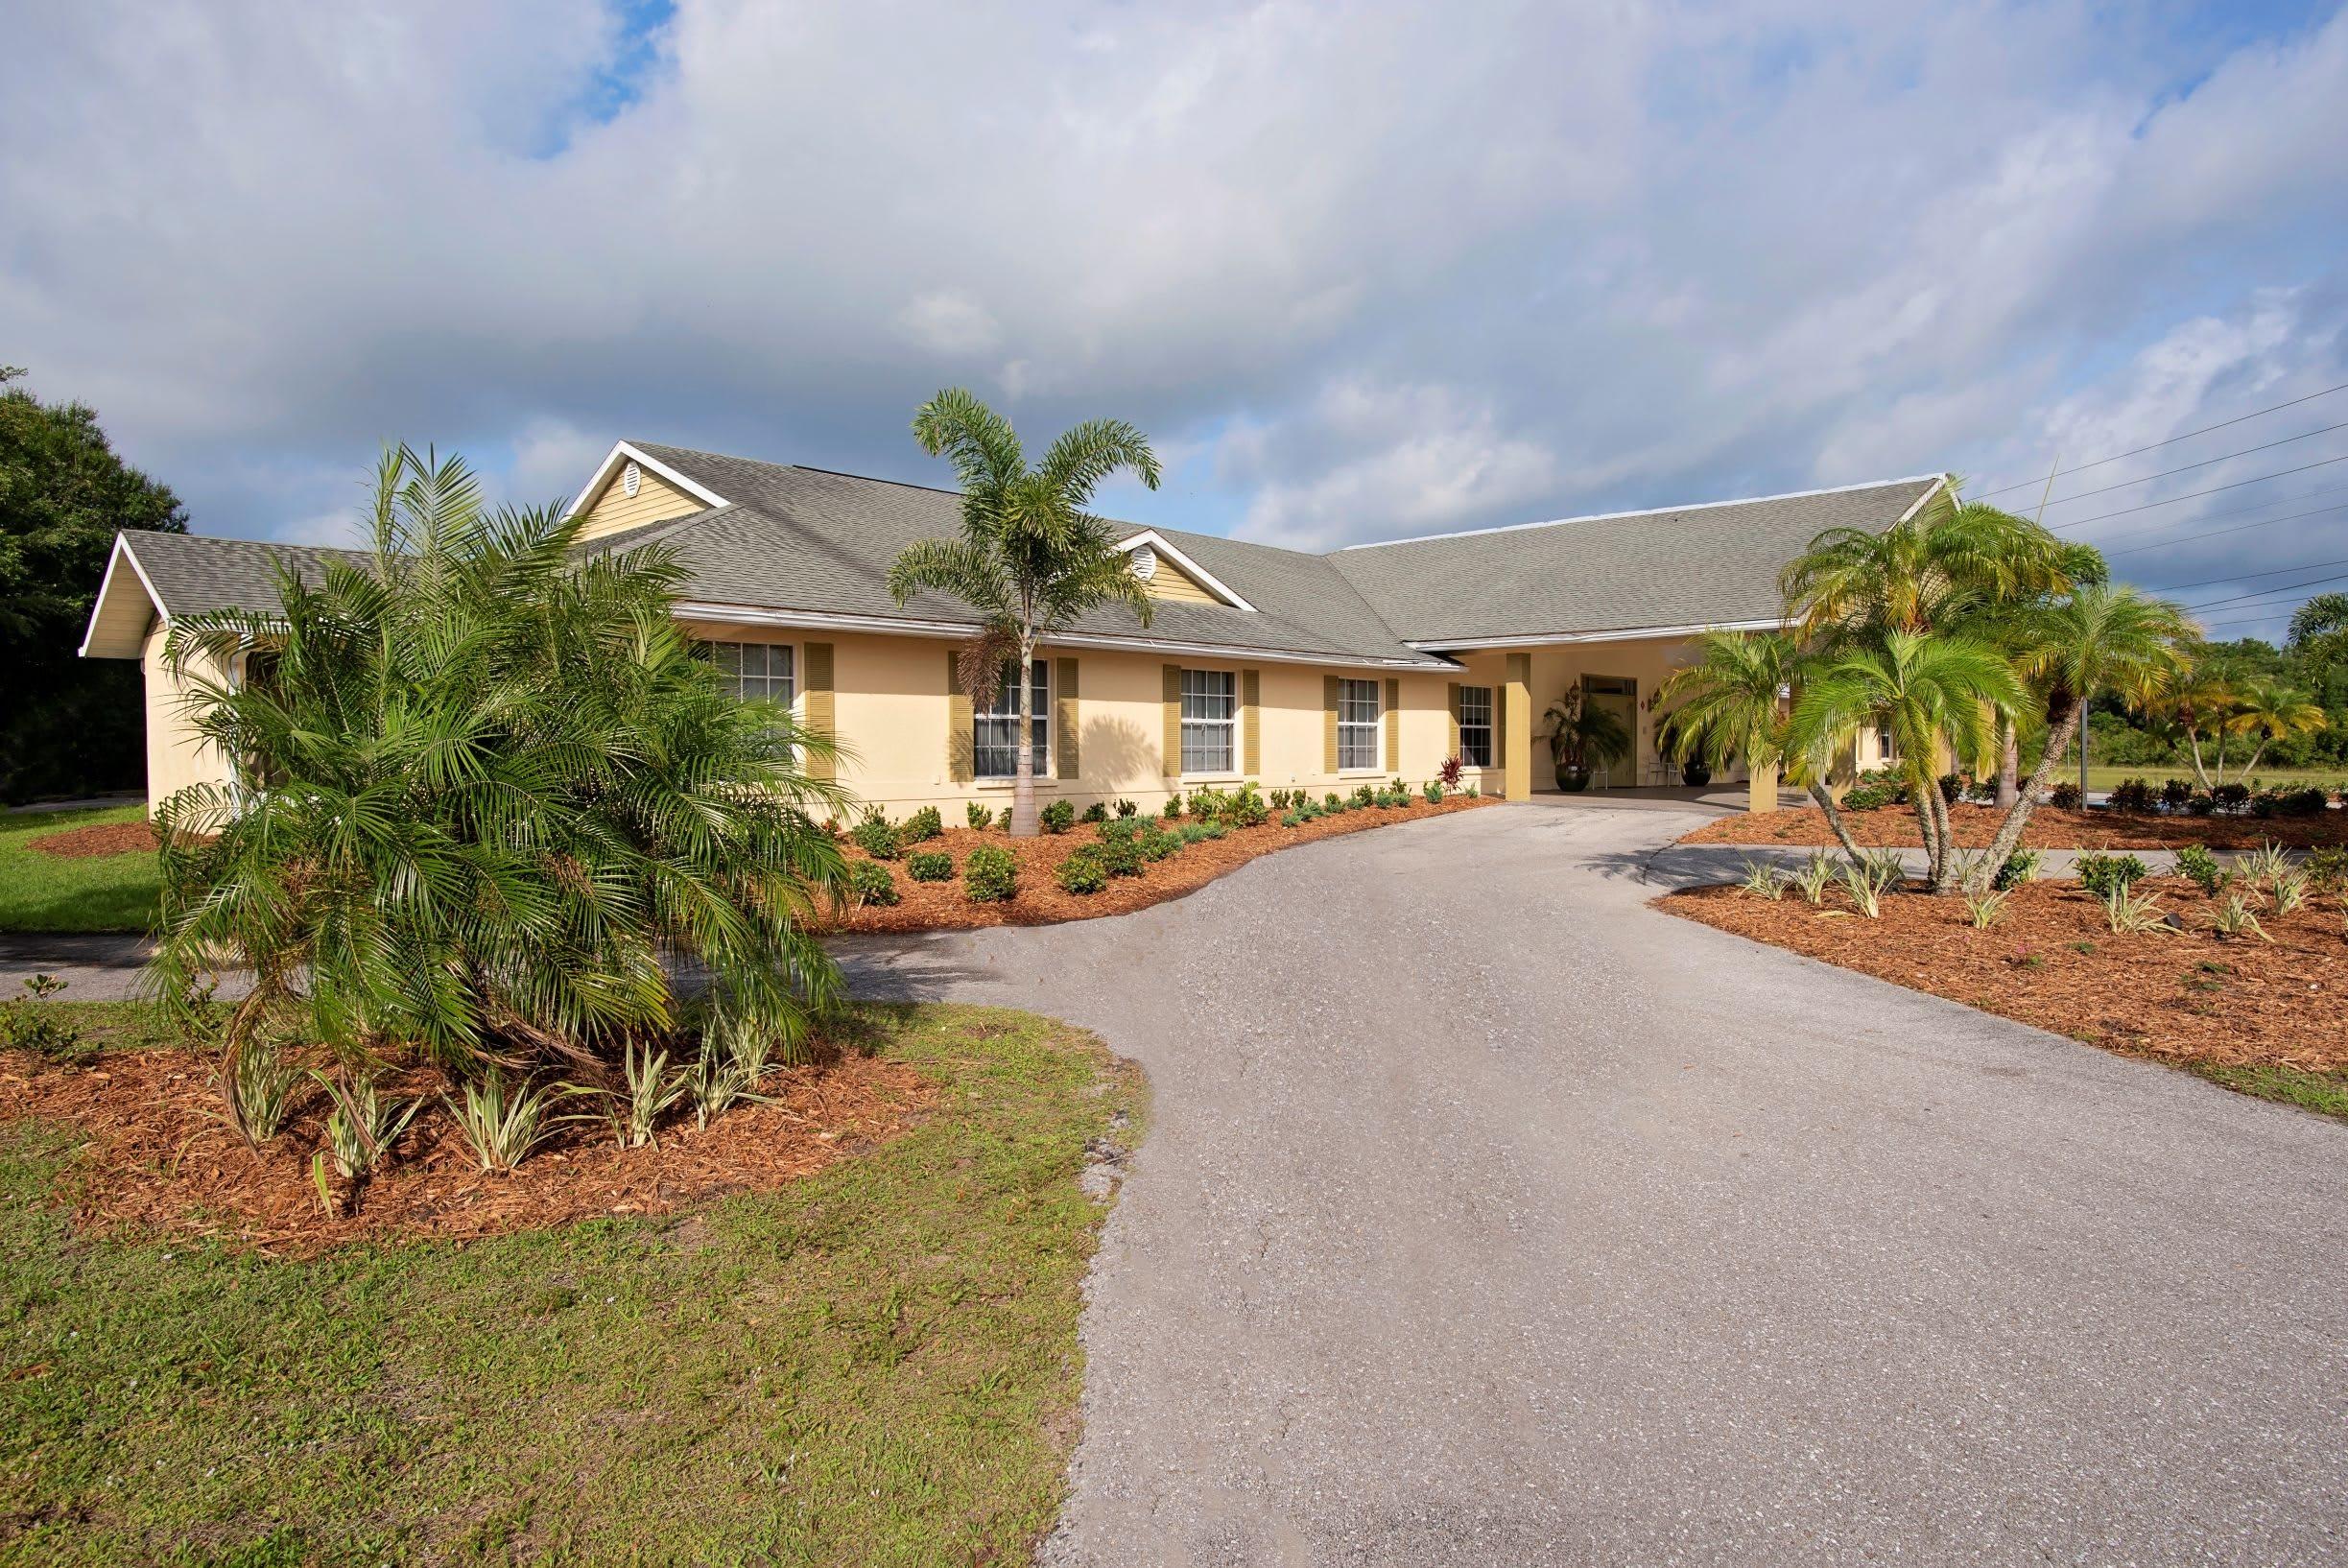 Photo 1 of Alder Terrace Care Center